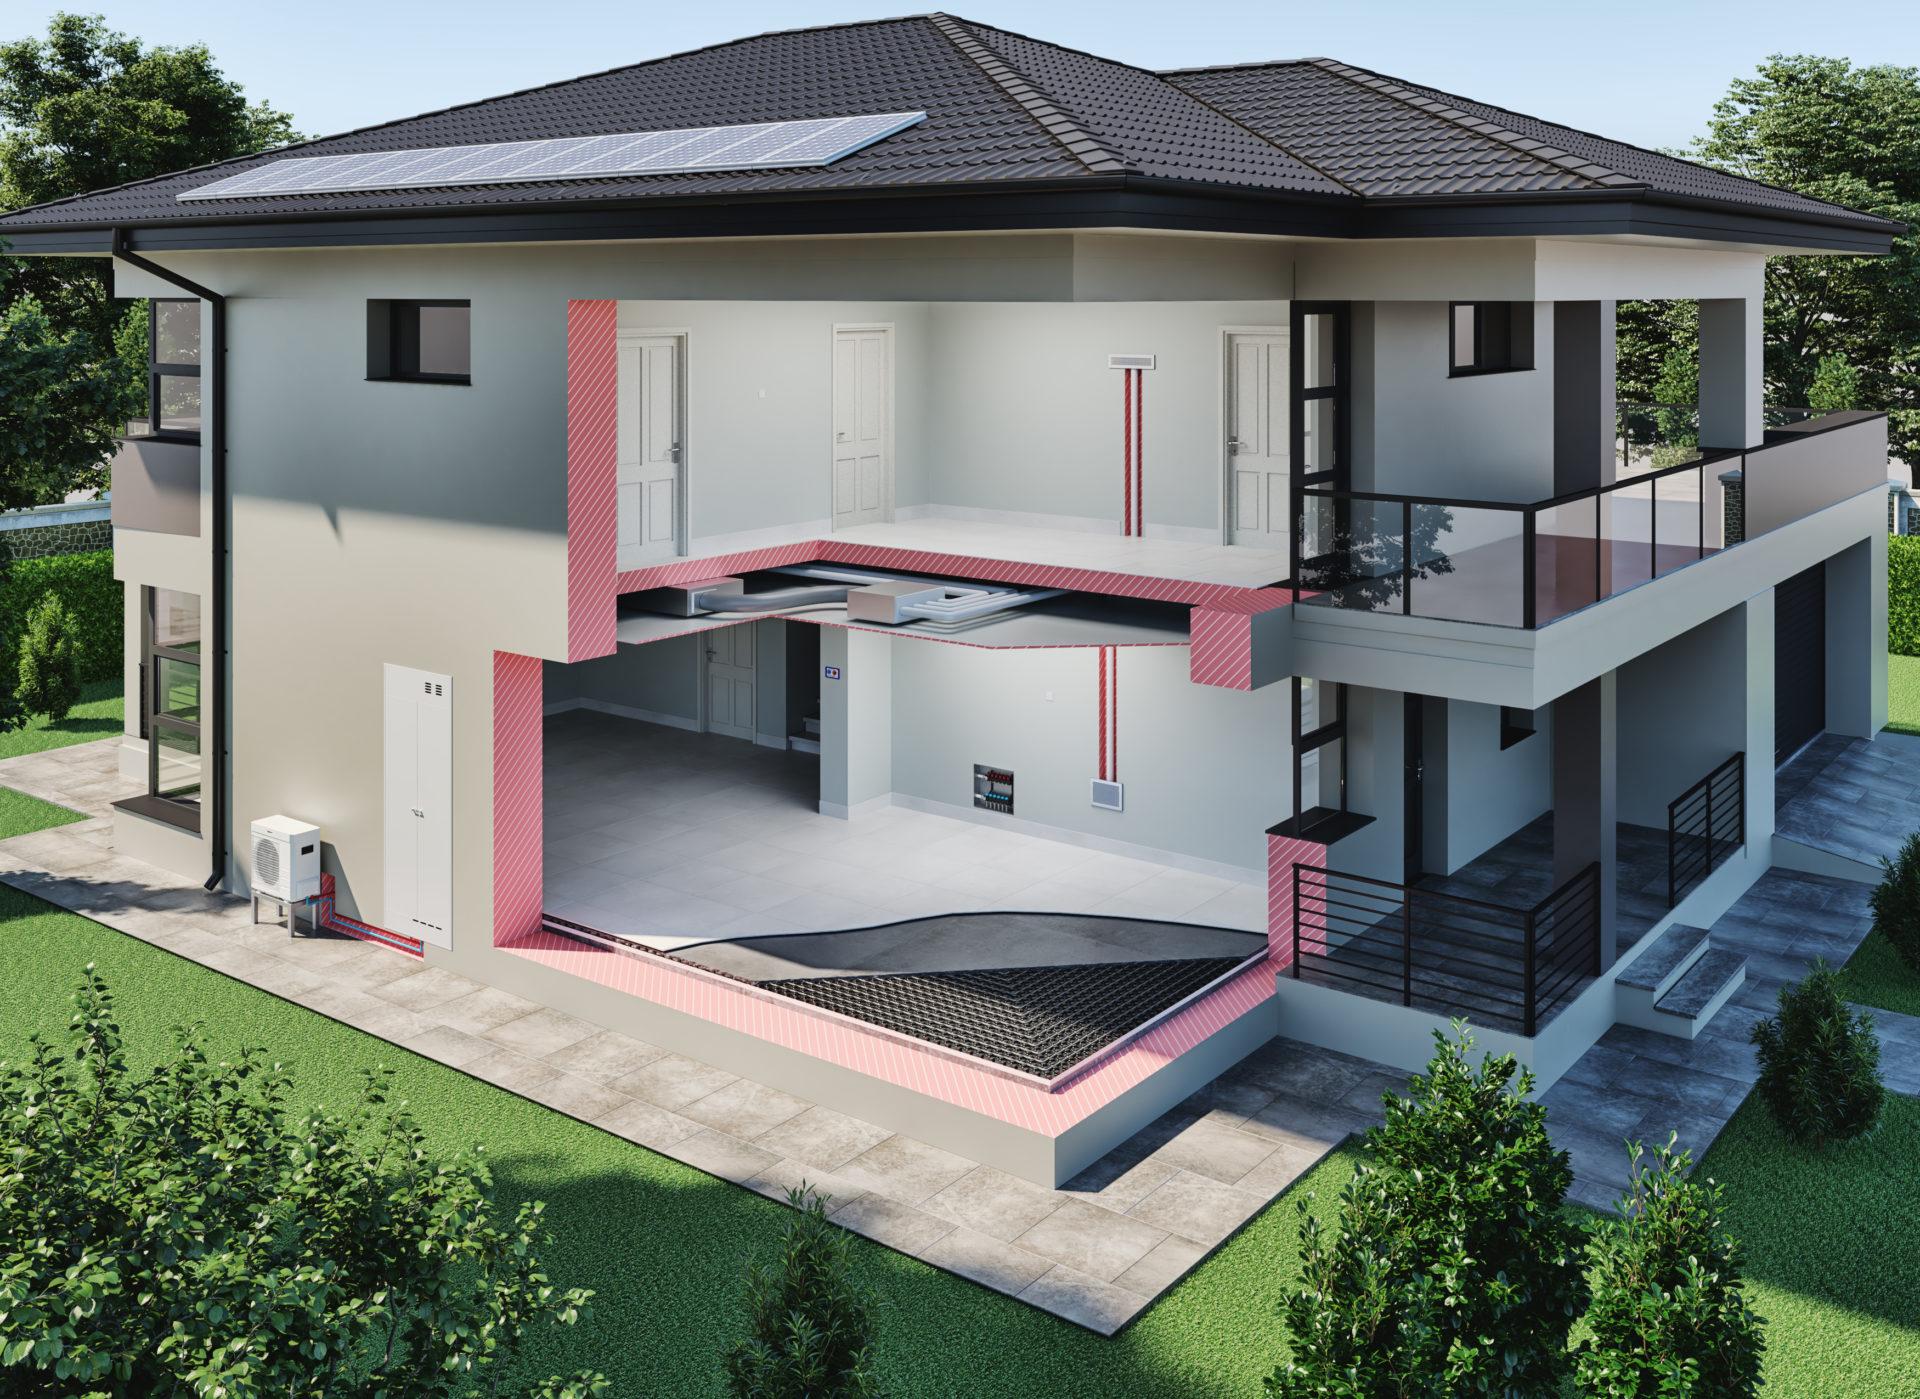 Viessmann evid